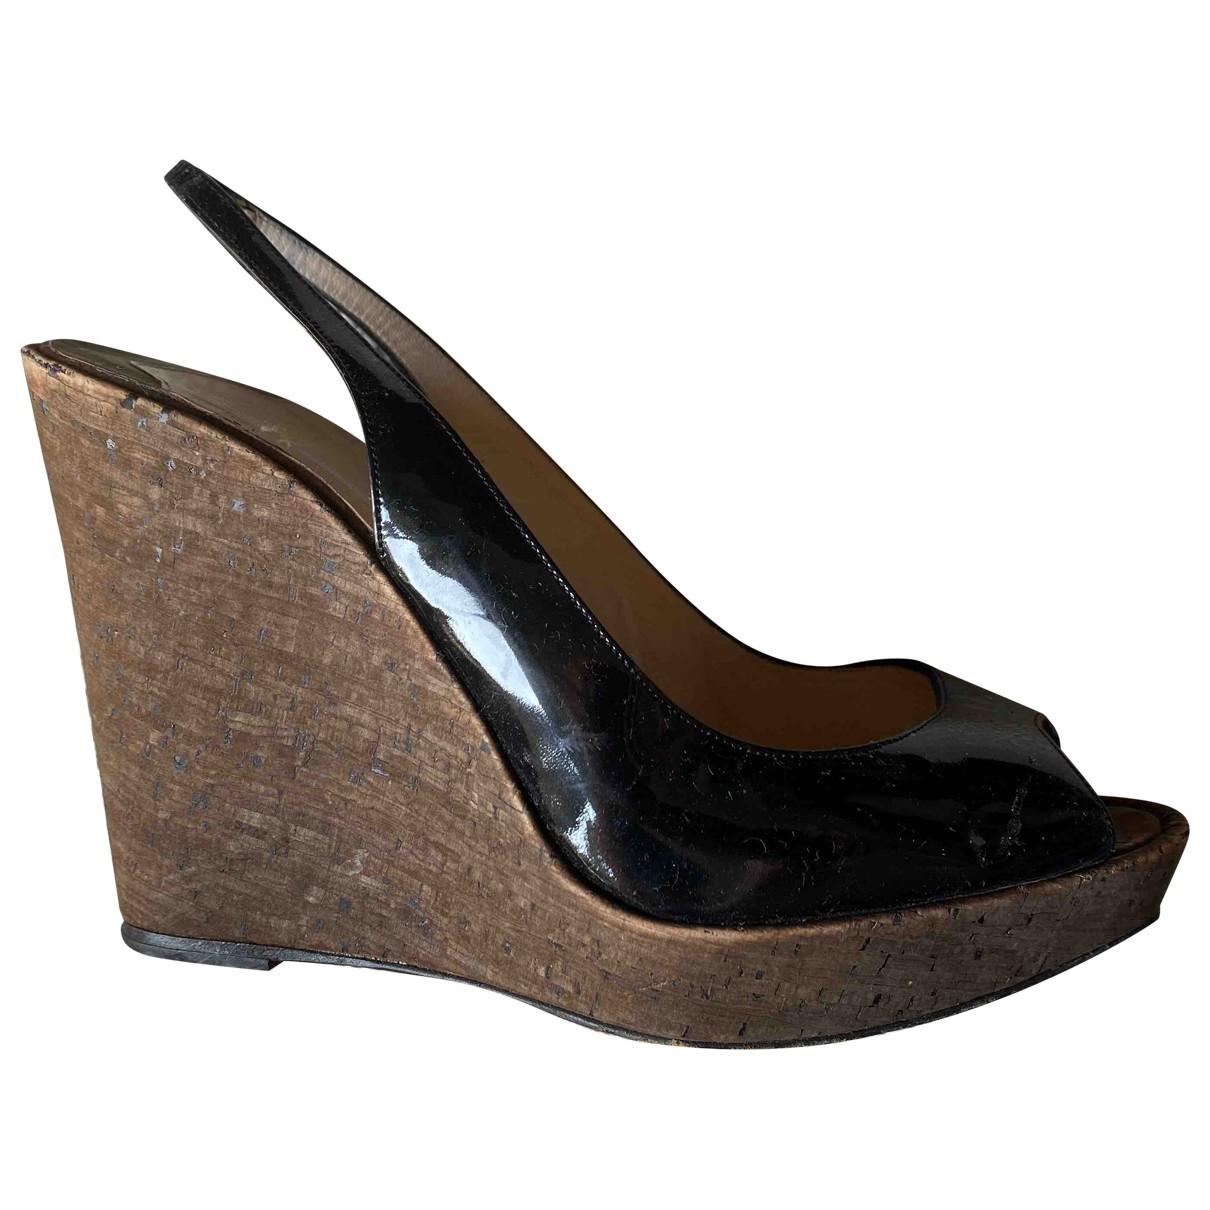 Christian Louboutin \N Black Patent leather Heels for Women 40 EU